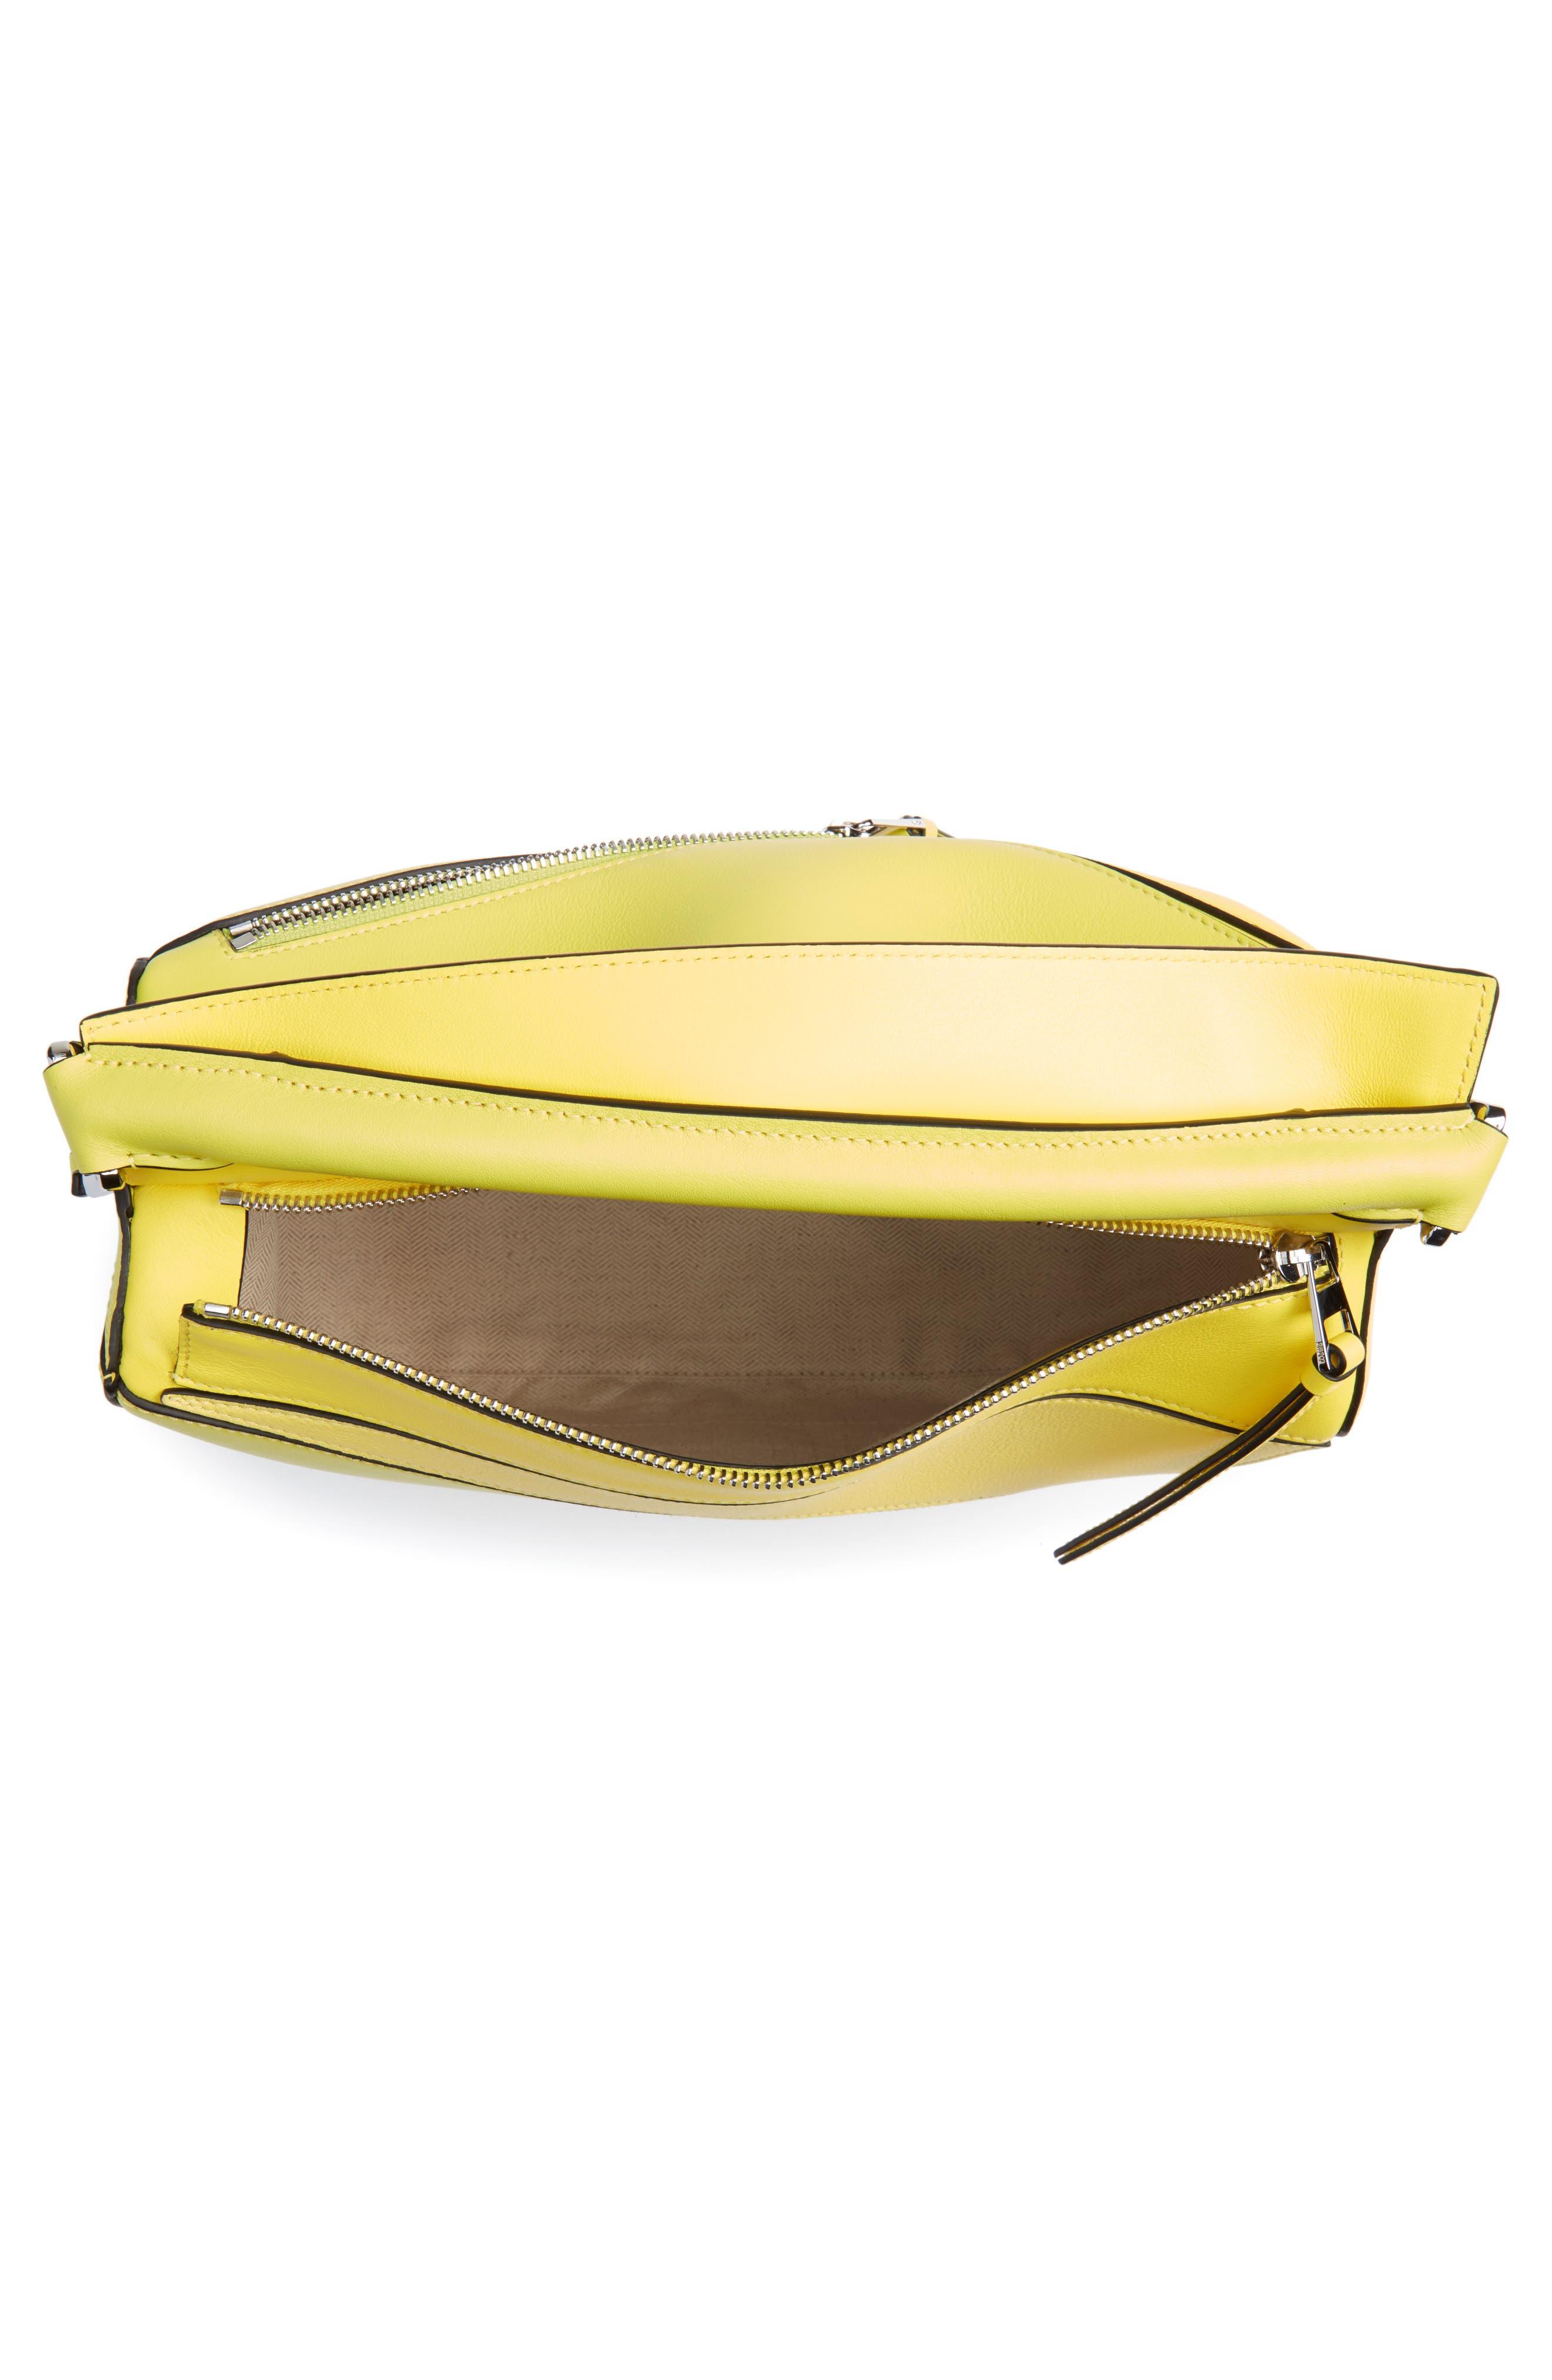 Medium Puzzle Calfskin Leather Shoulder Bag,                             Alternate thumbnail 5, color,                             Yellow Multitone